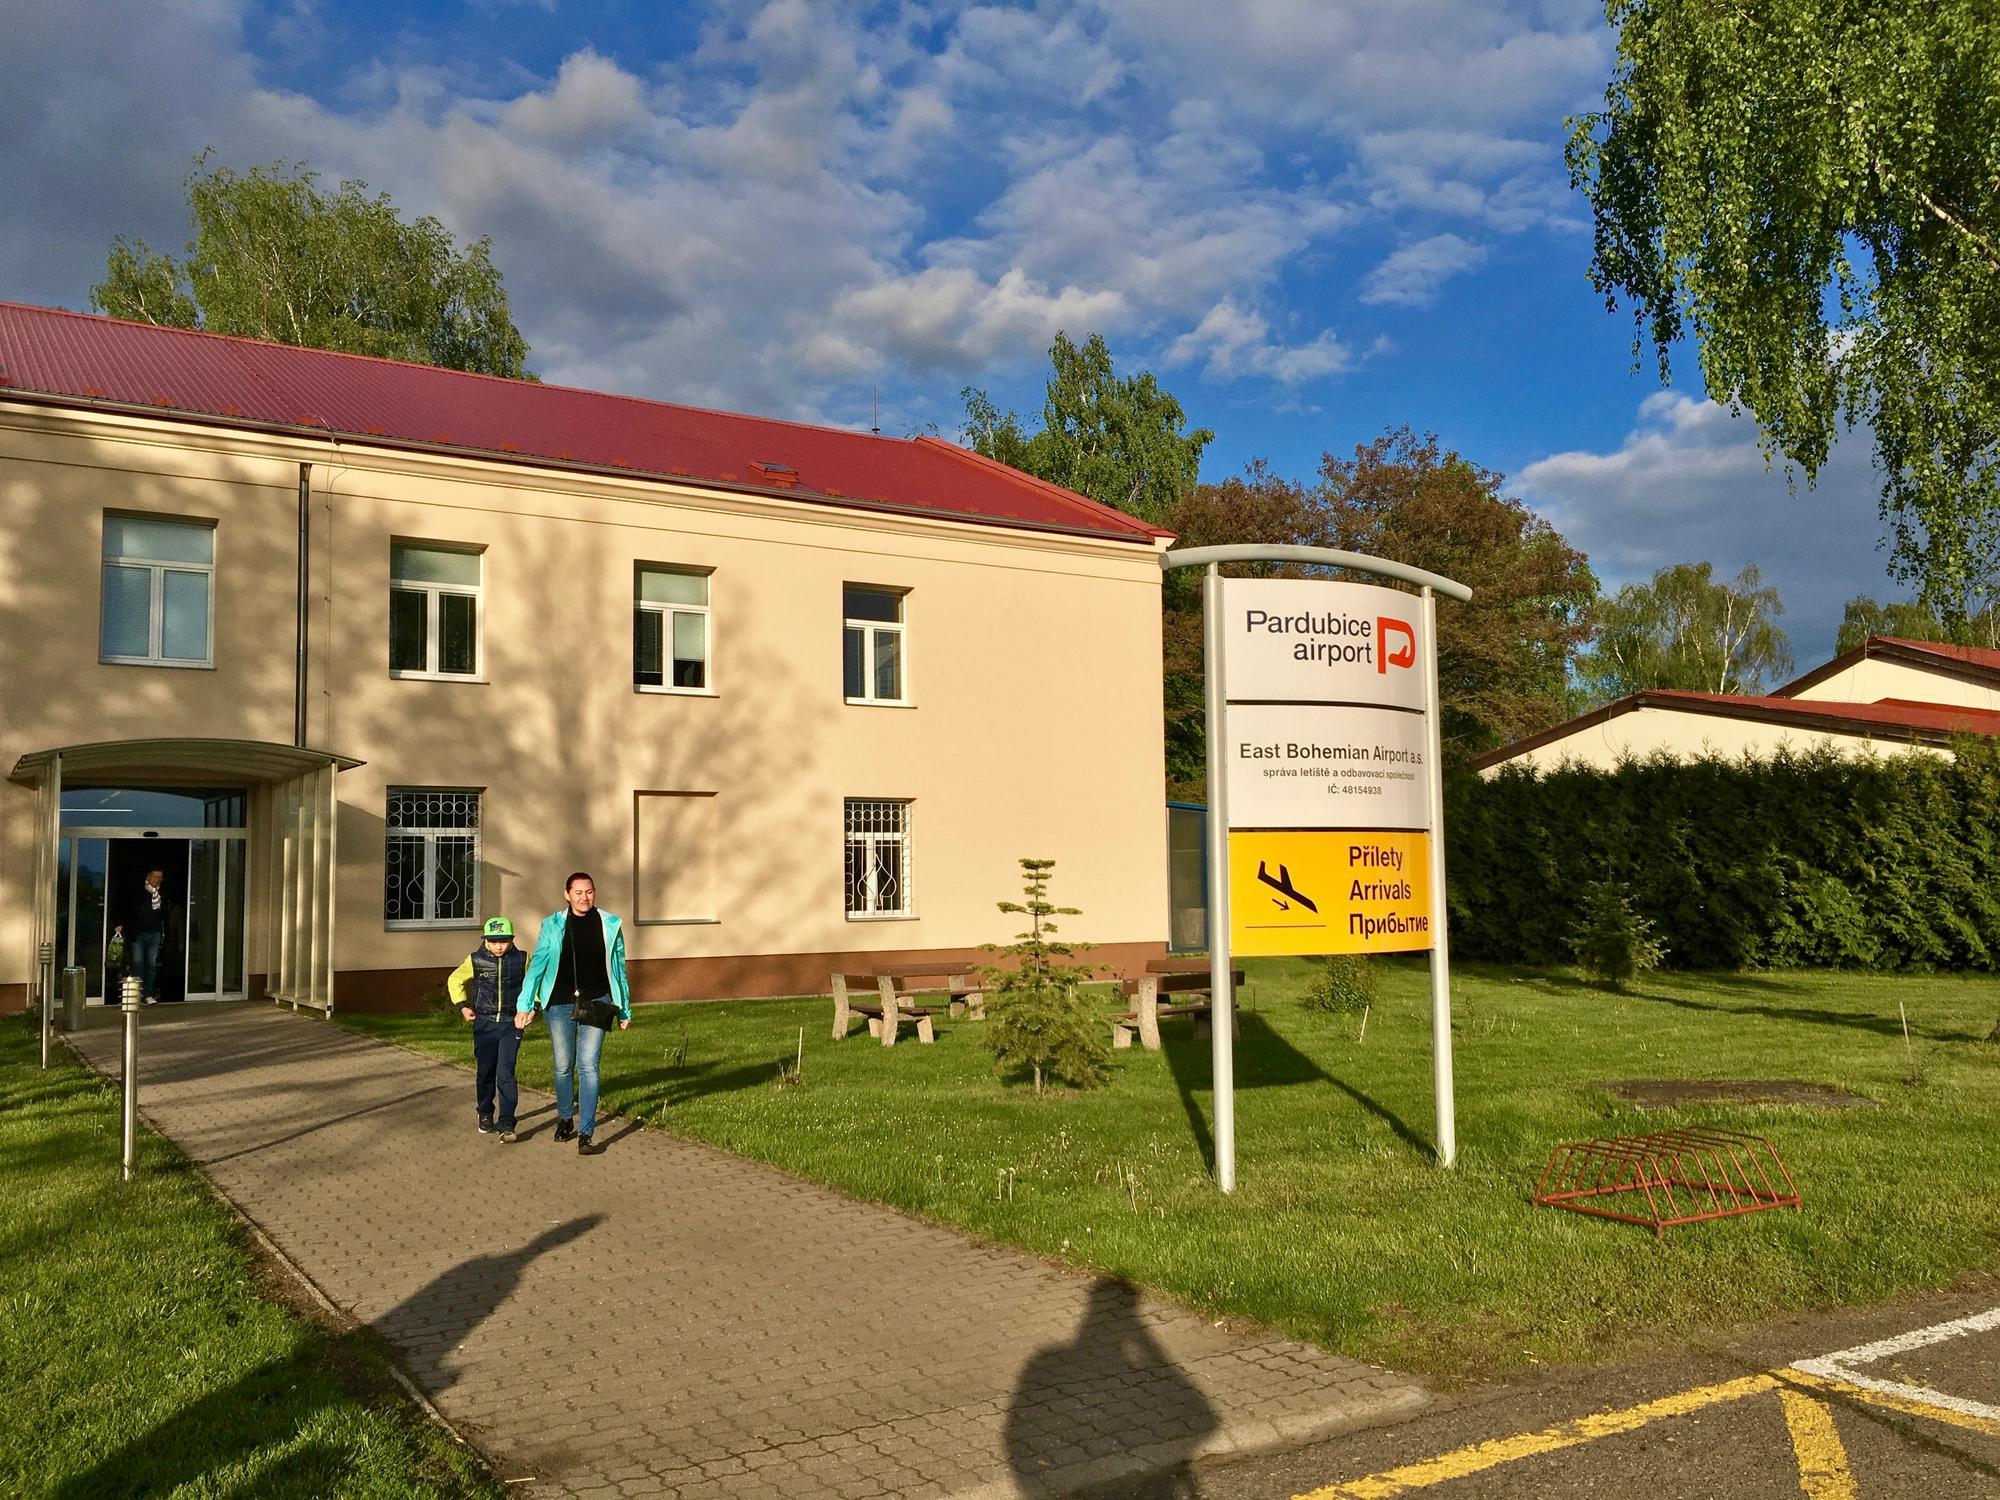 🇨🇿 Pardubice, Czech Republic, may 2017.